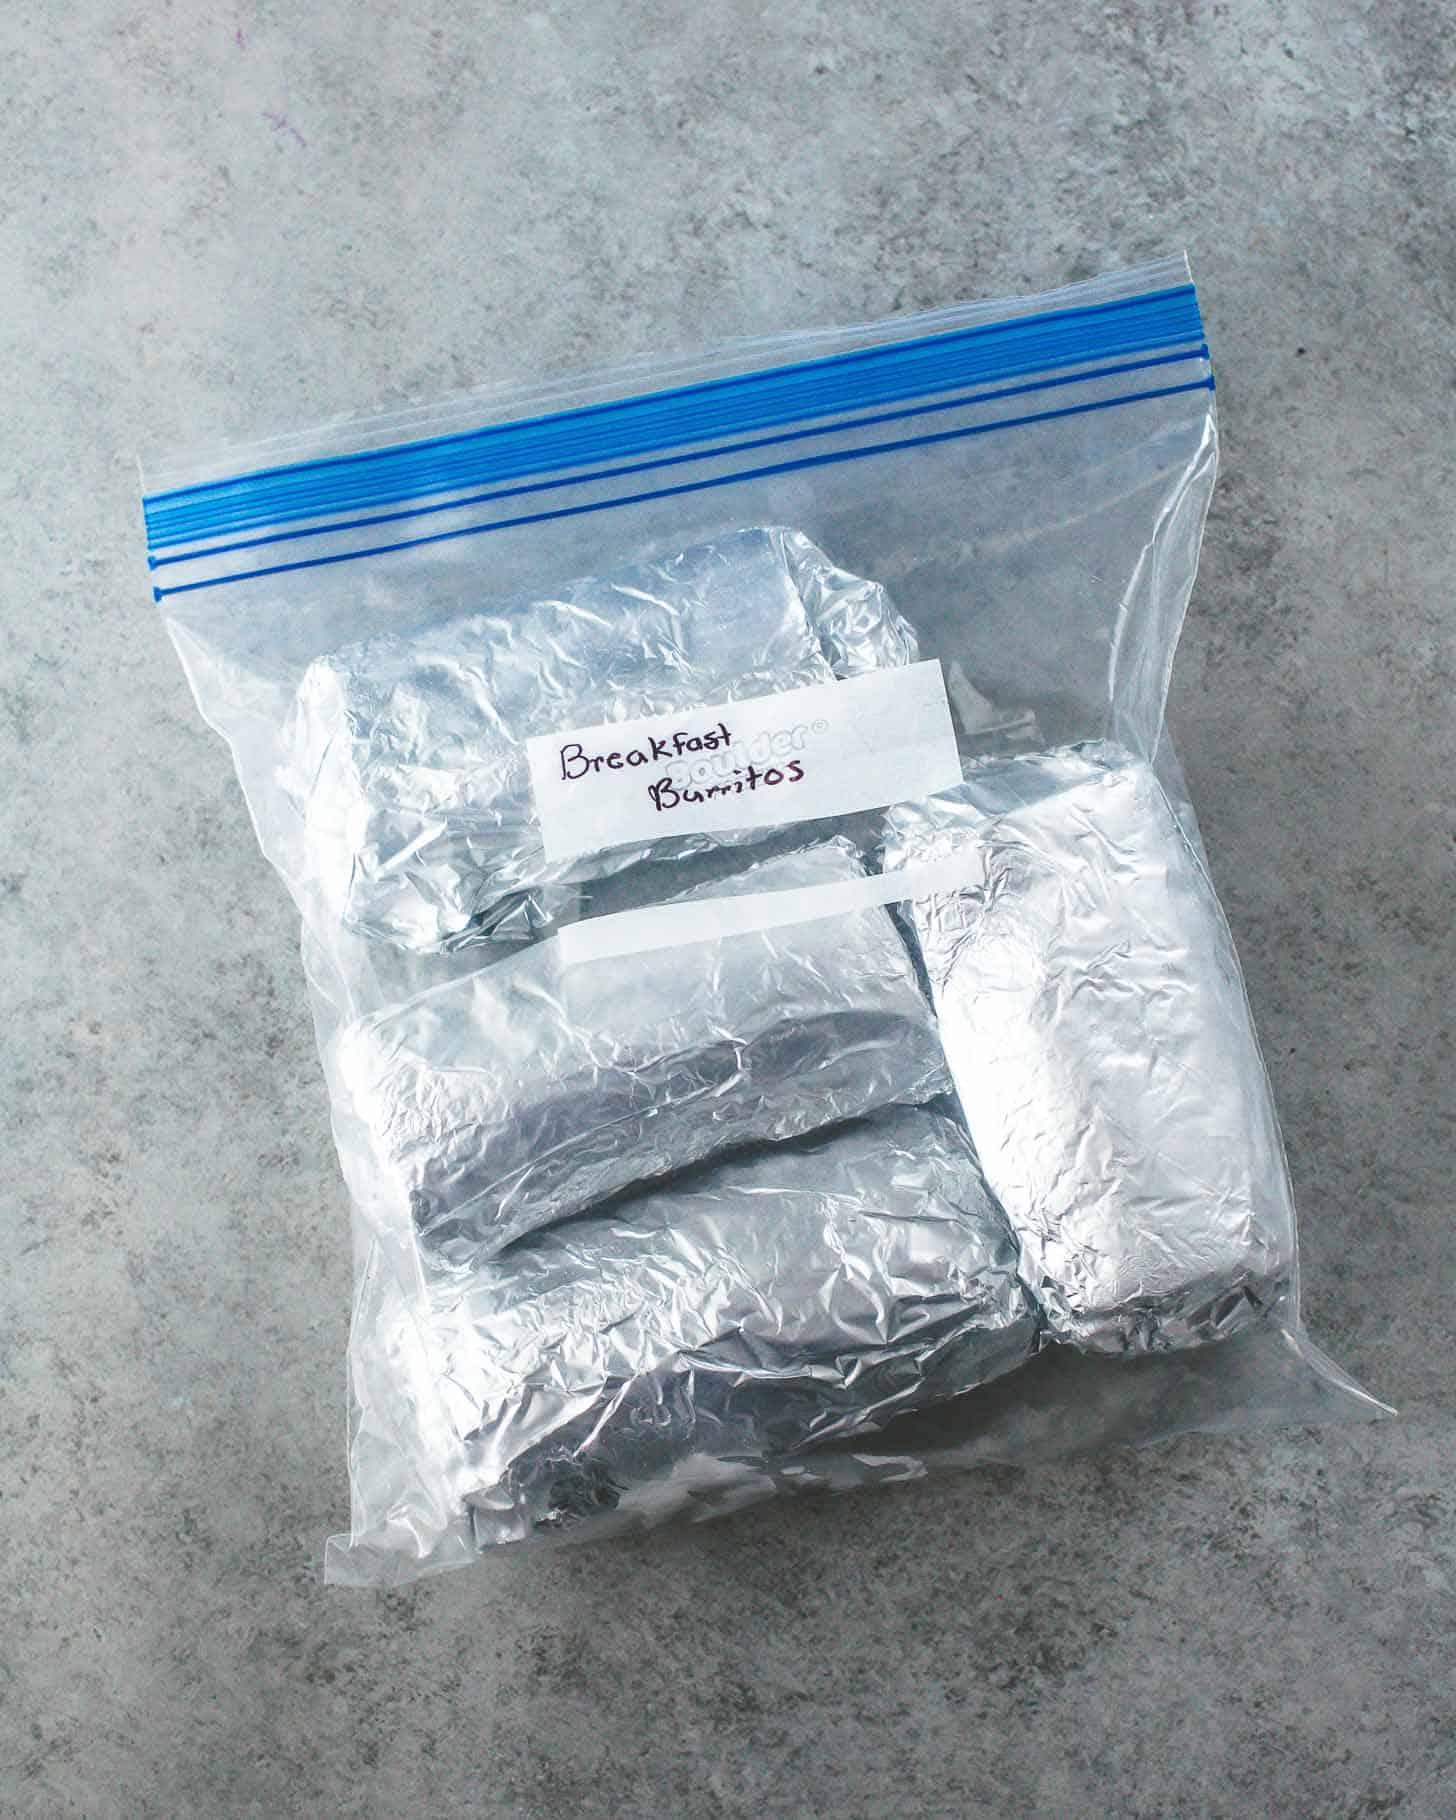 Make-Ahead Breakfast Burritos in a freezer bag